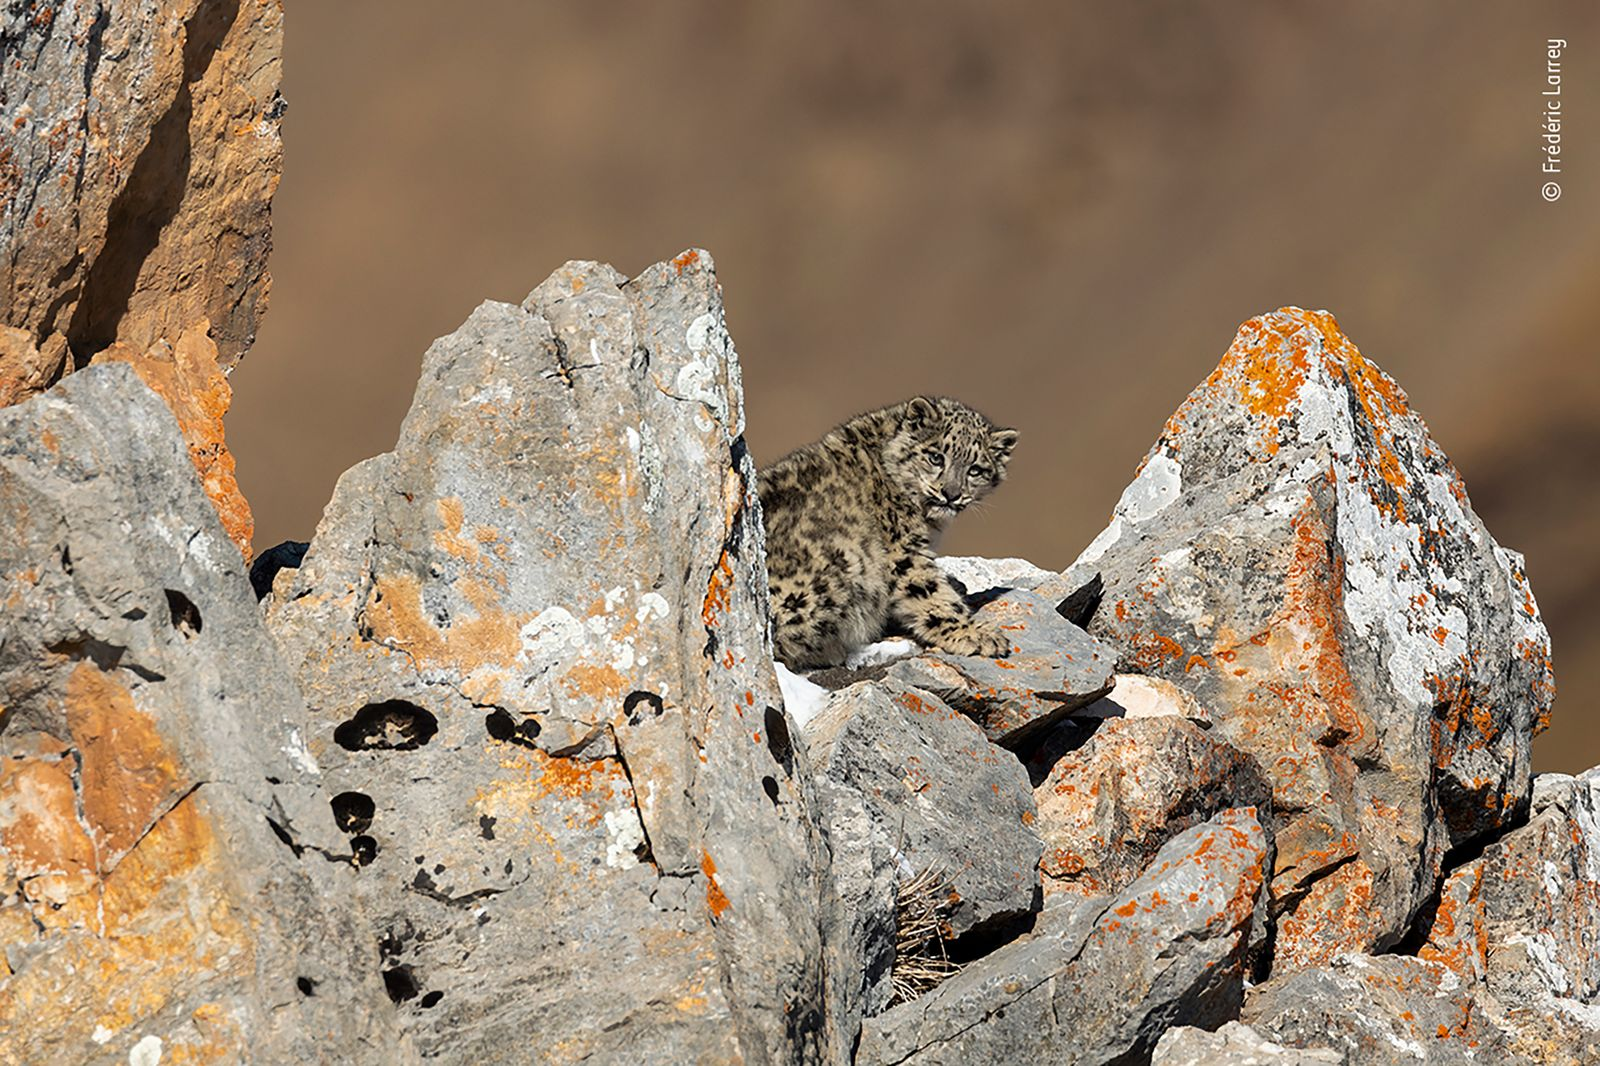 Baby on the rocks by Frédéric Larrey, France